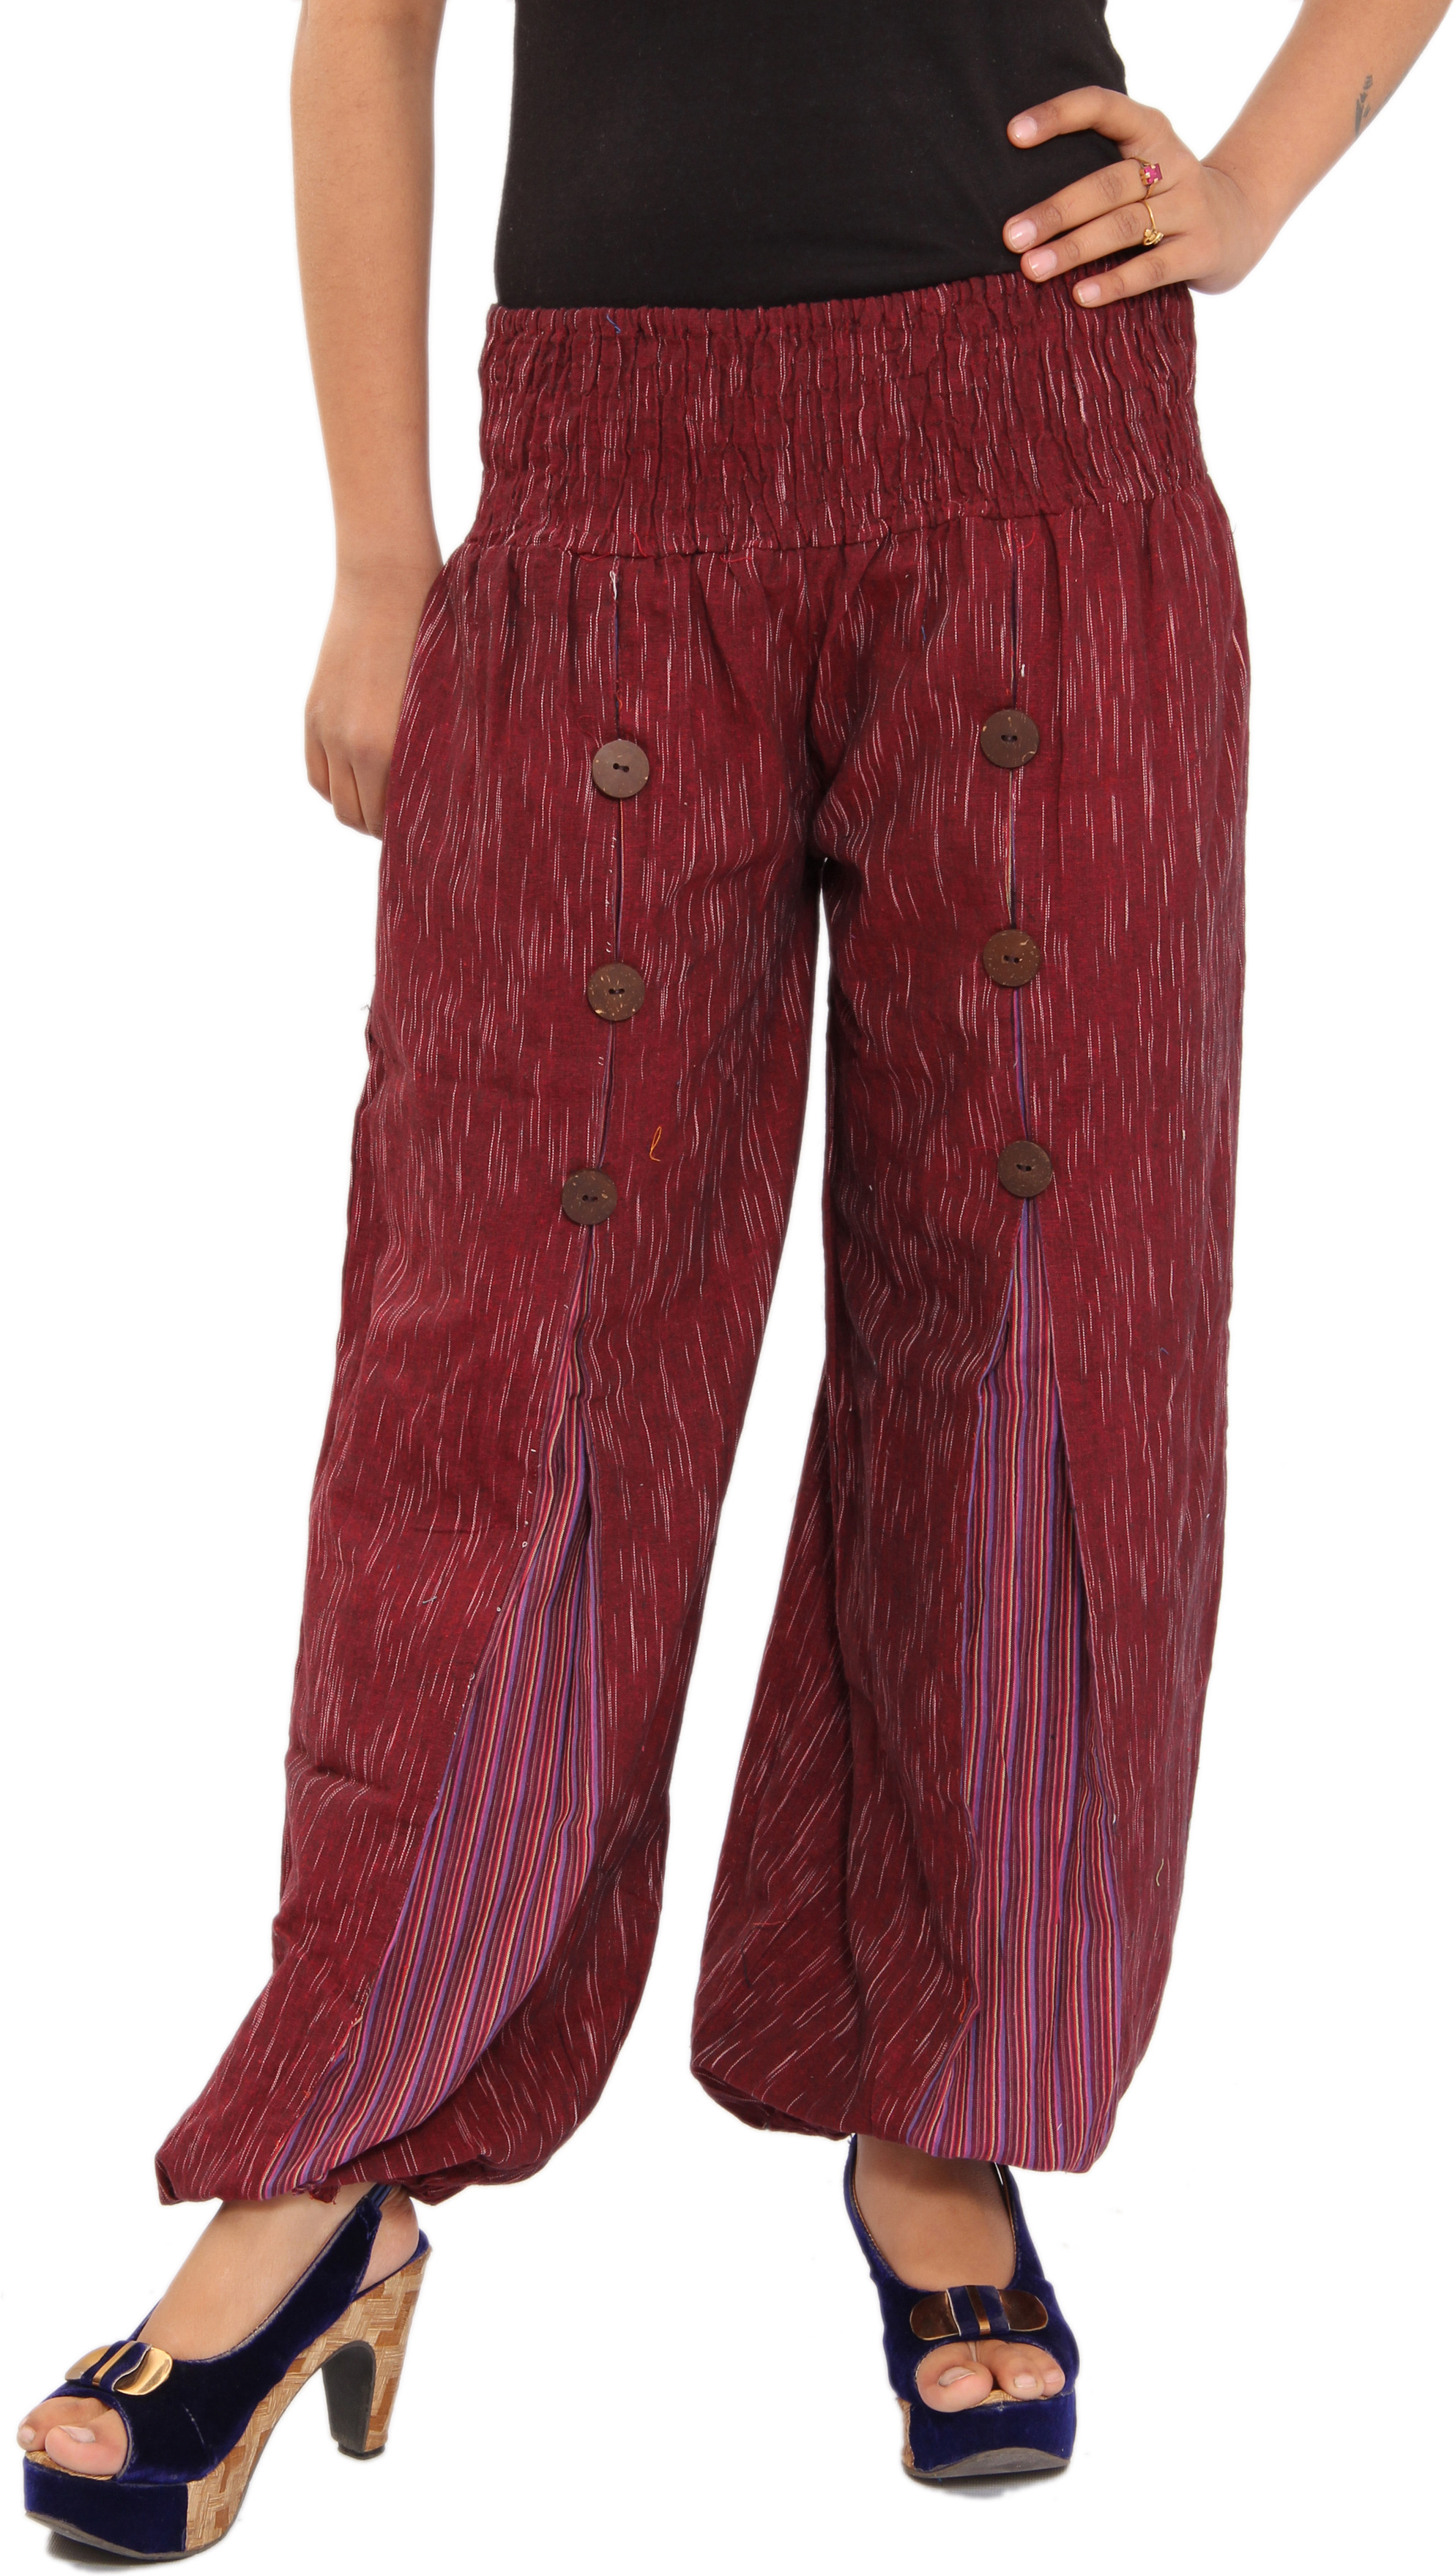 Shop Rajasthan Self Design Cotton Womens Harem Pants